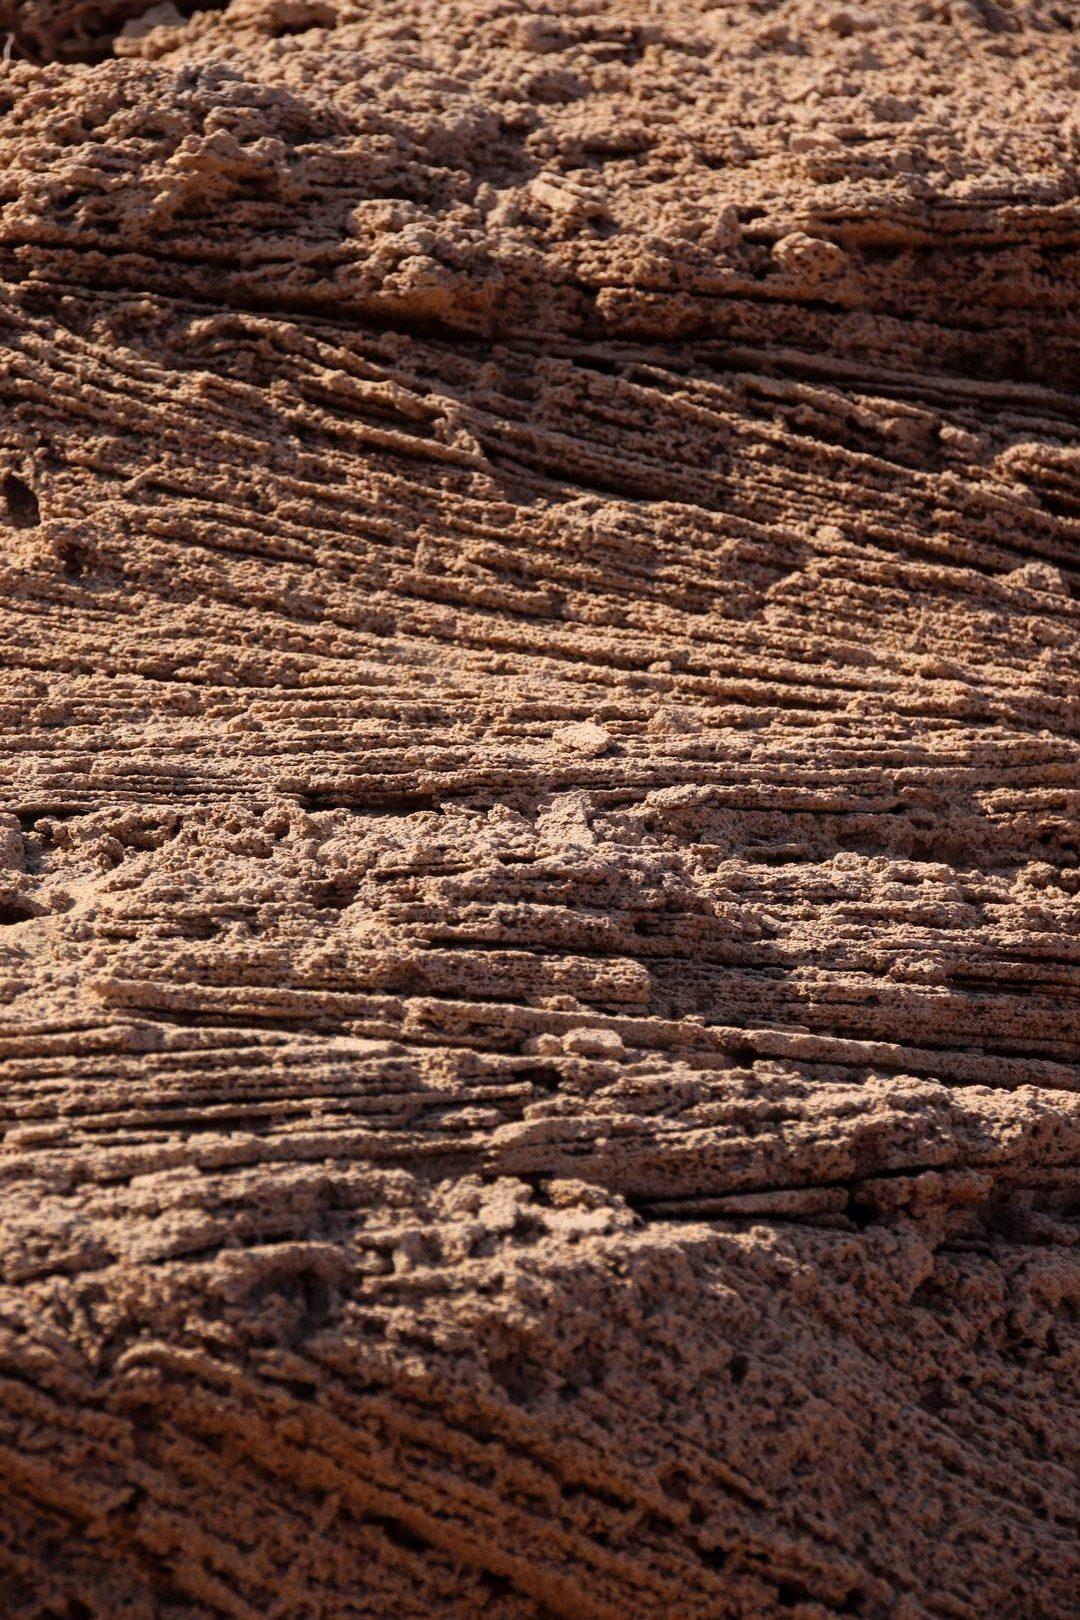 Maroc - Stries dans la roche